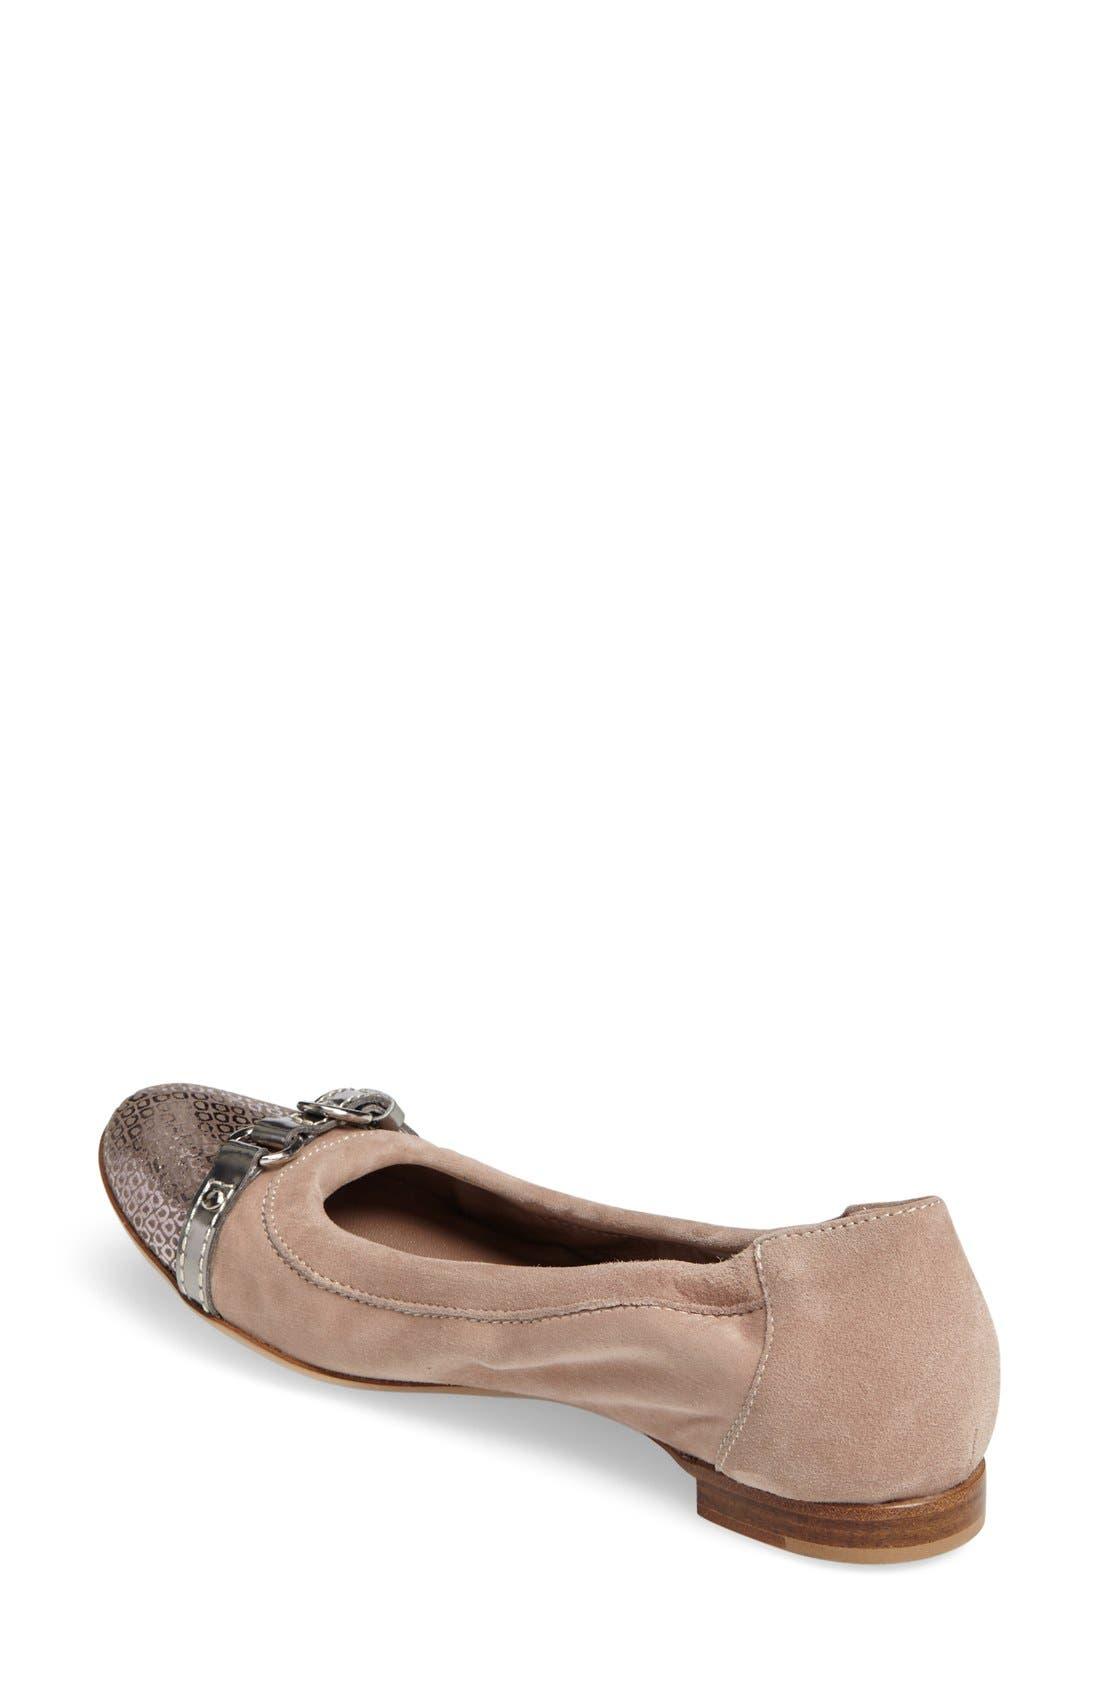 ,                             Cap Toe Ballet Flat,                             Alternate thumbnail 249, color,                             030